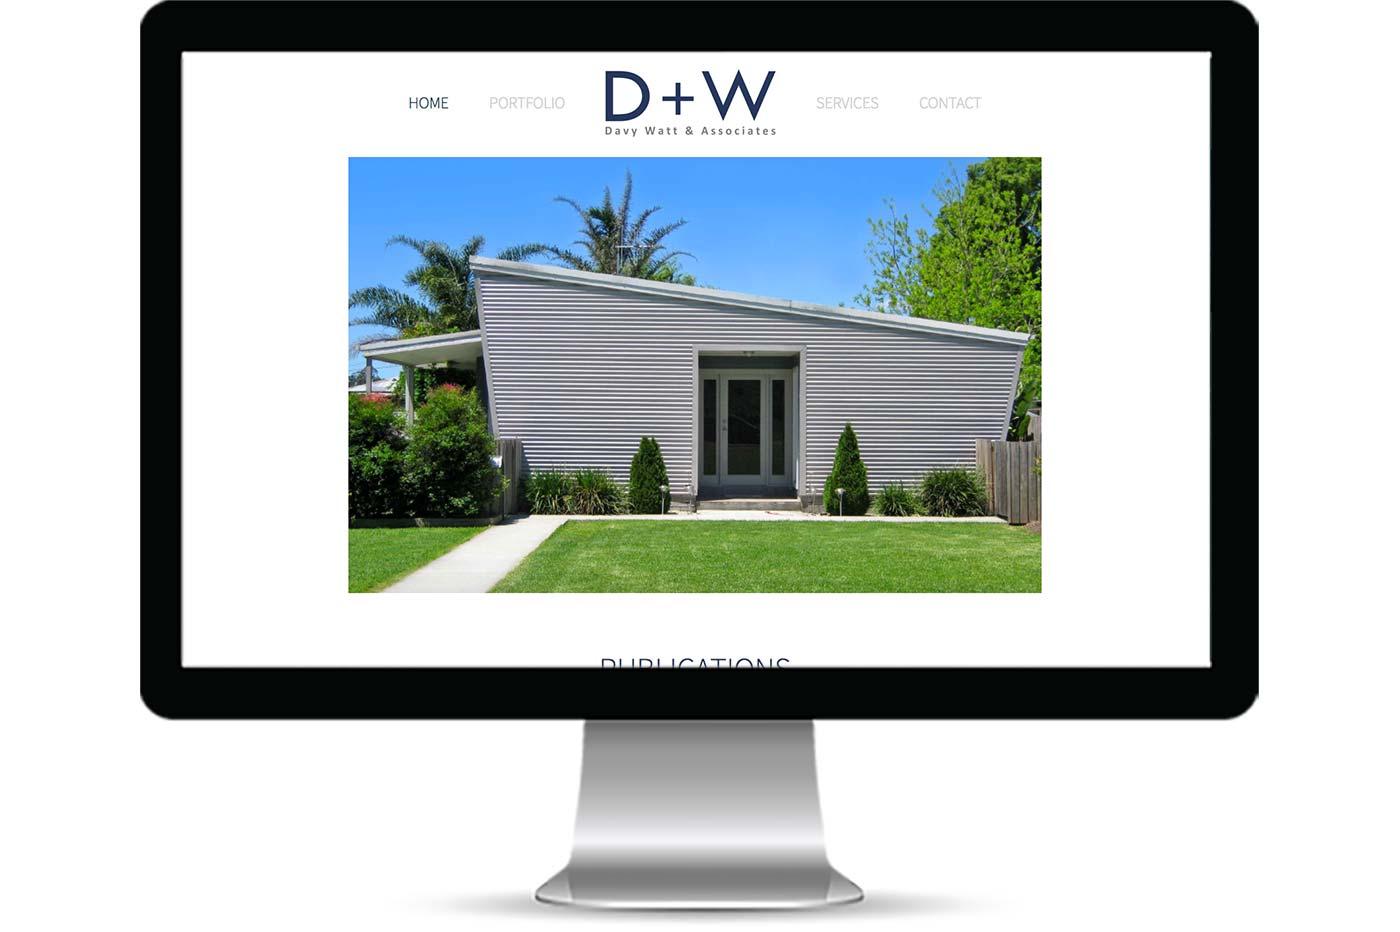 Advantage iT Solutions Web Portfolio - Davy Watt & Associates